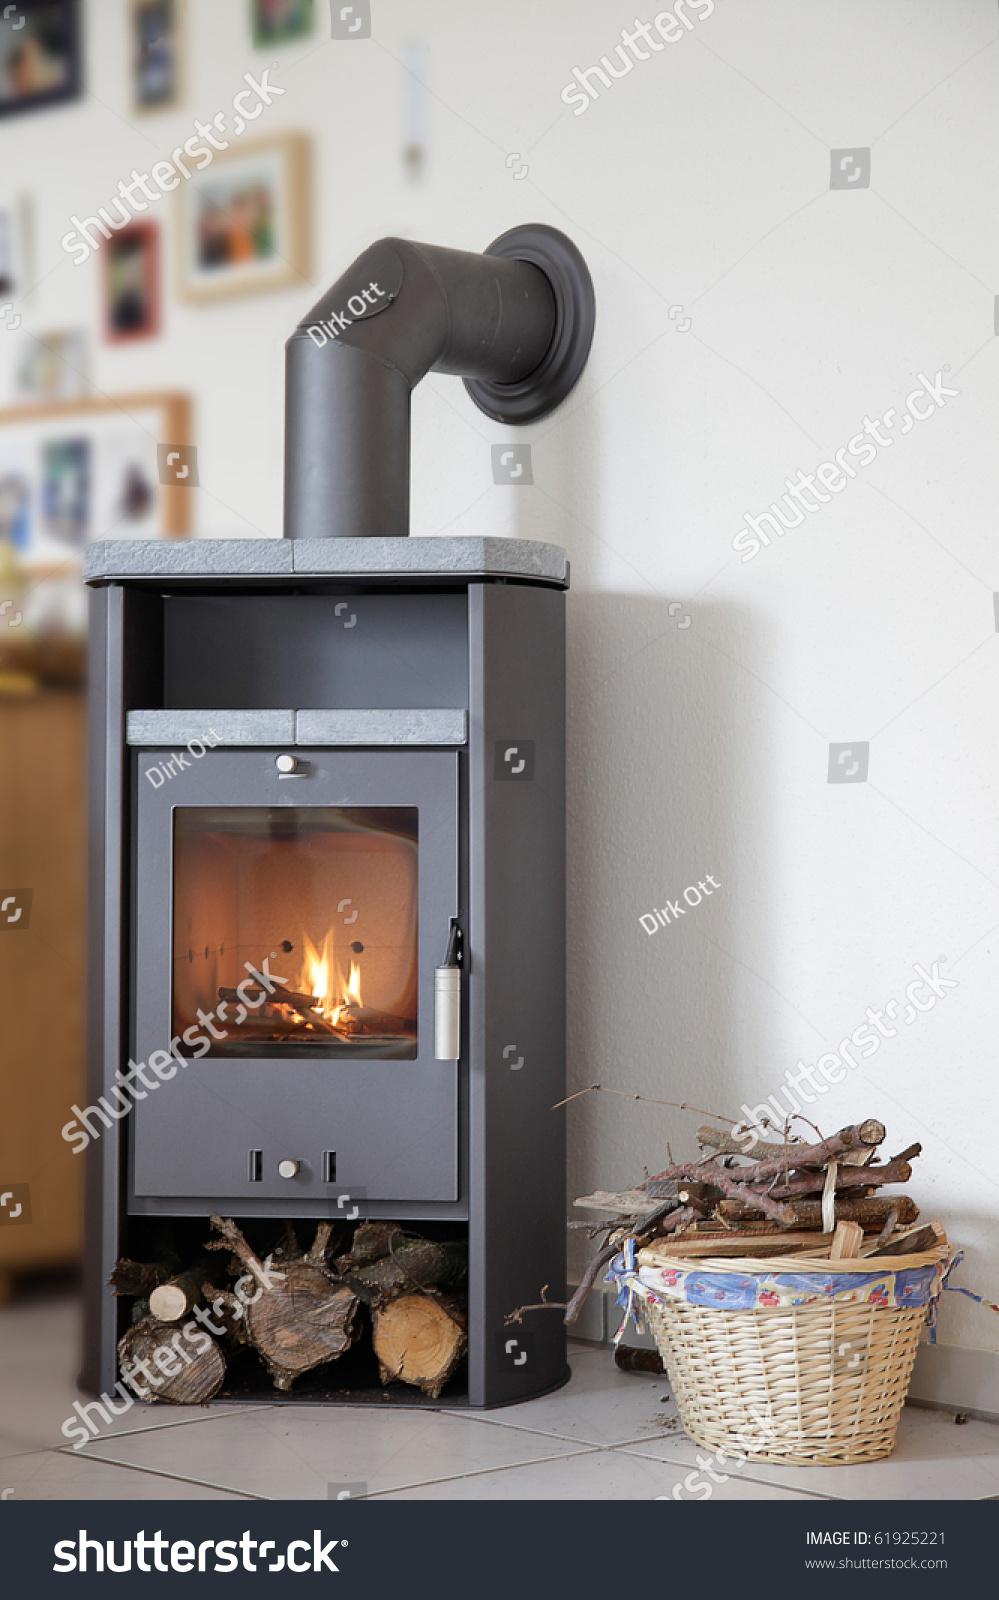 Modern wood burning stove inside cozy living room stock - Living room with wood burning stove ...